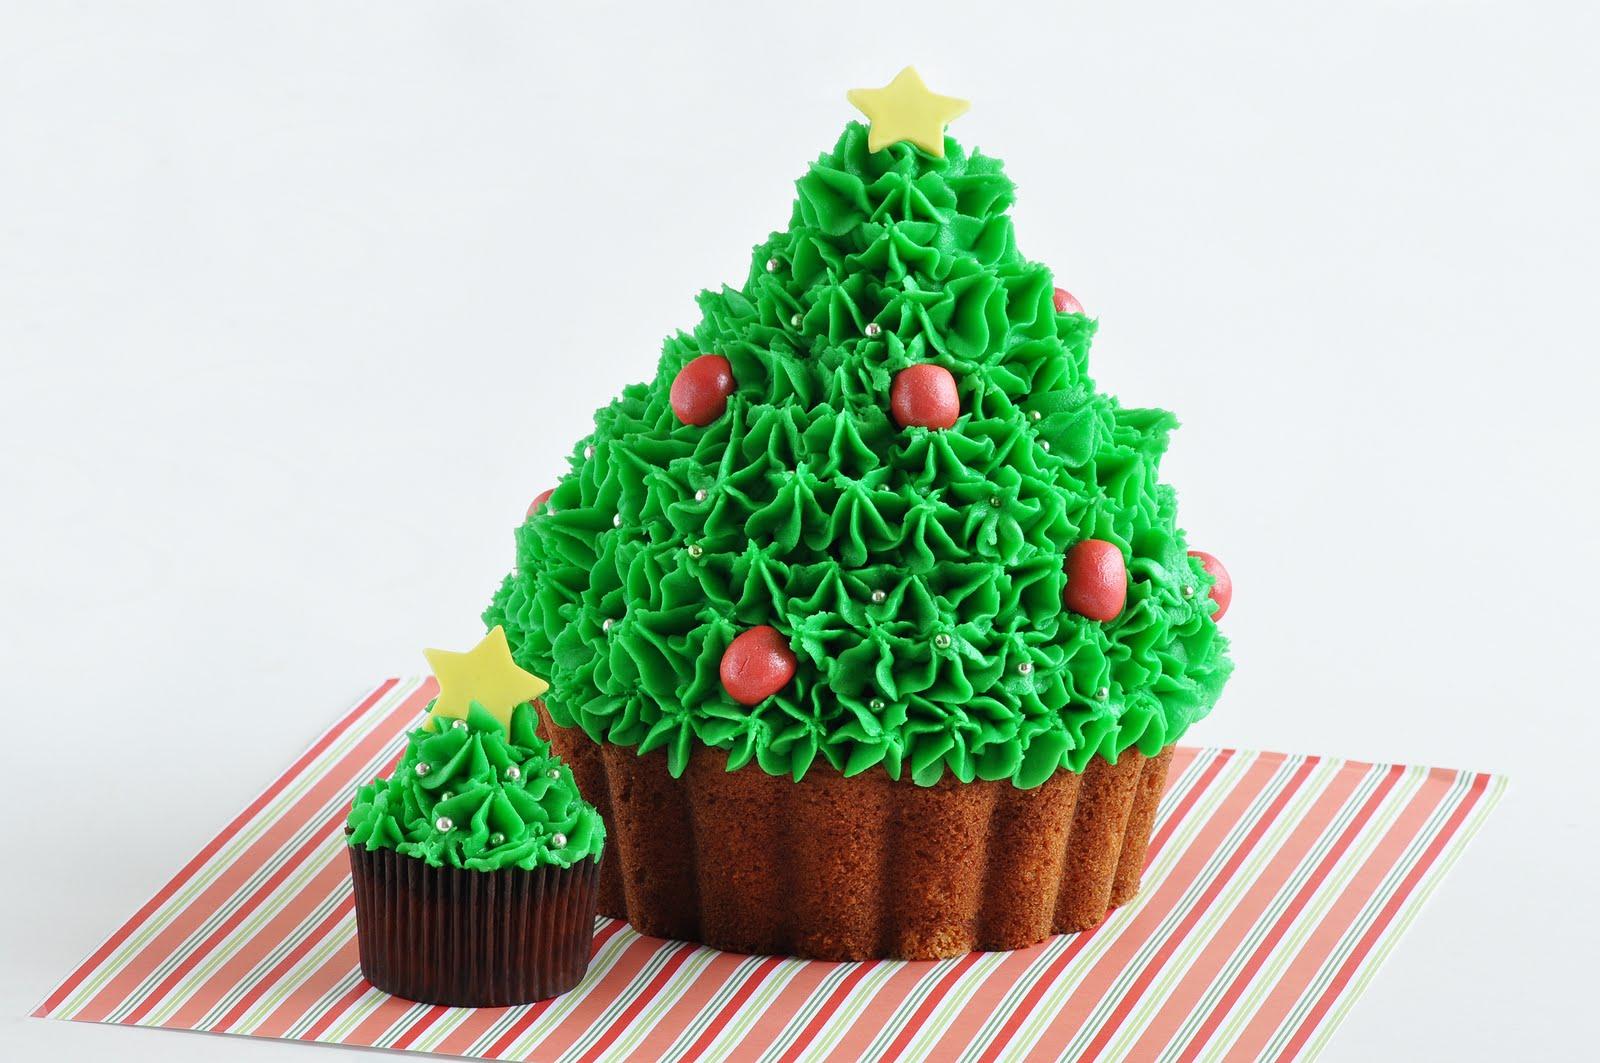 Delish Cupcakes: Win A Giant Christmas Cupcake